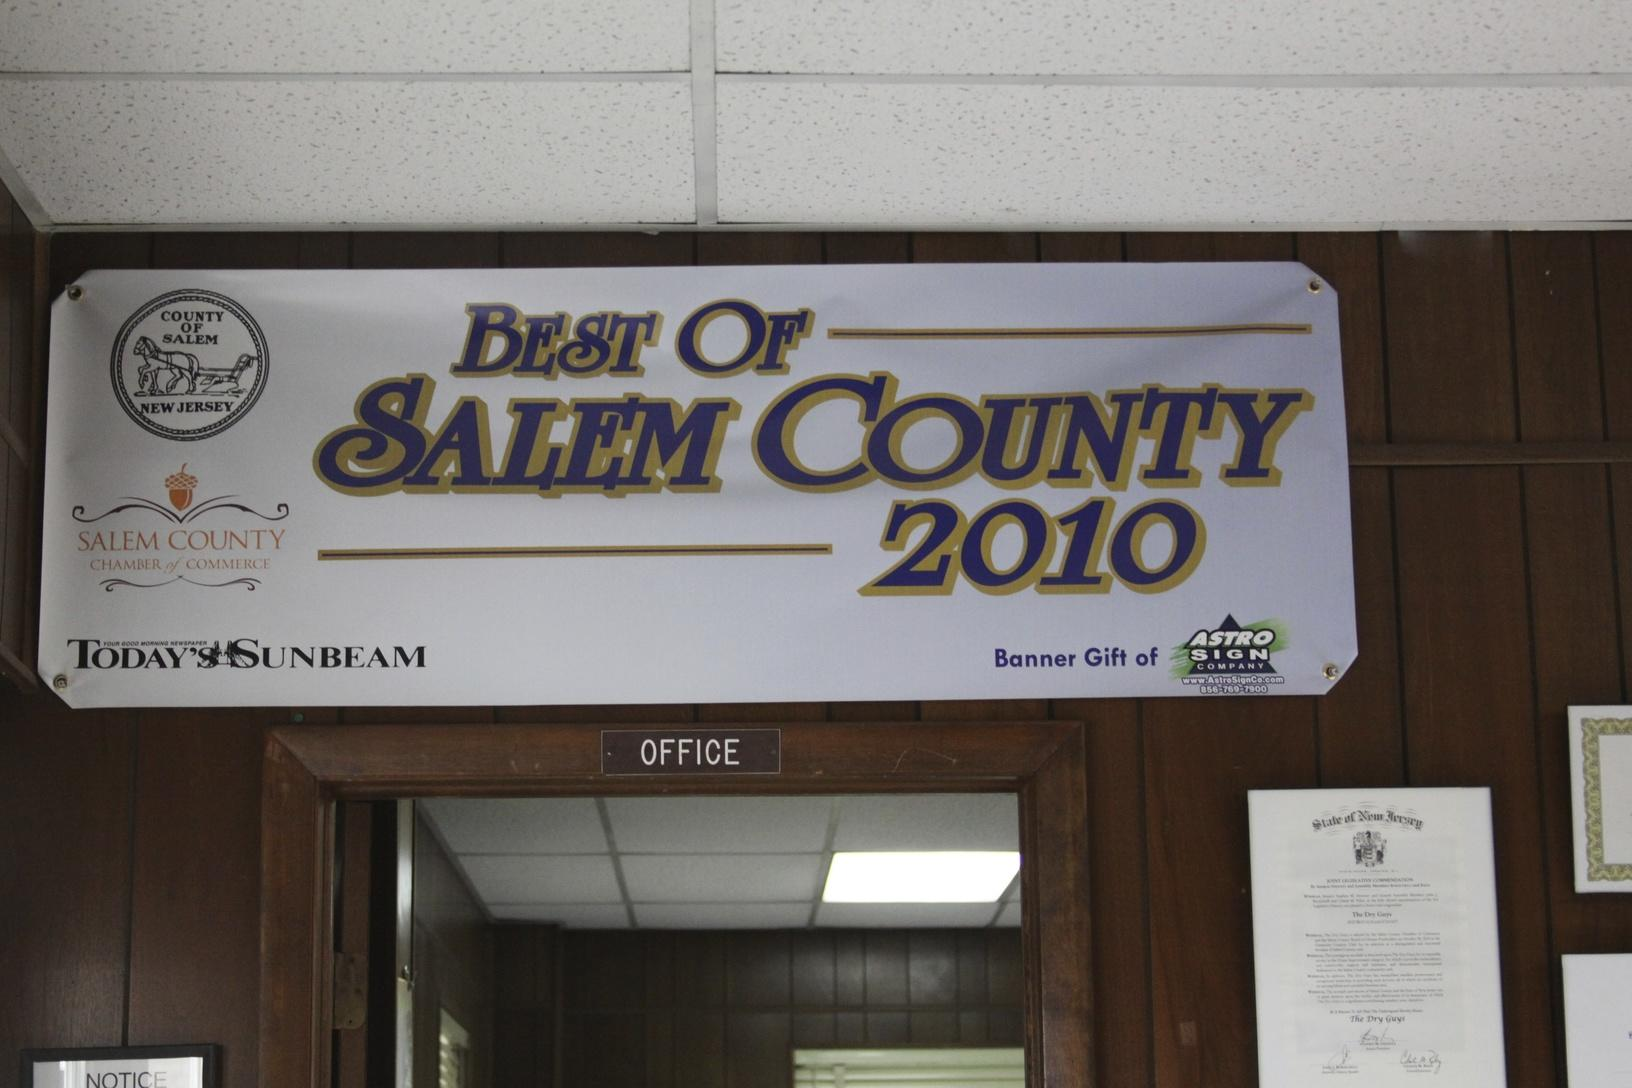 Best in Salem County 2010